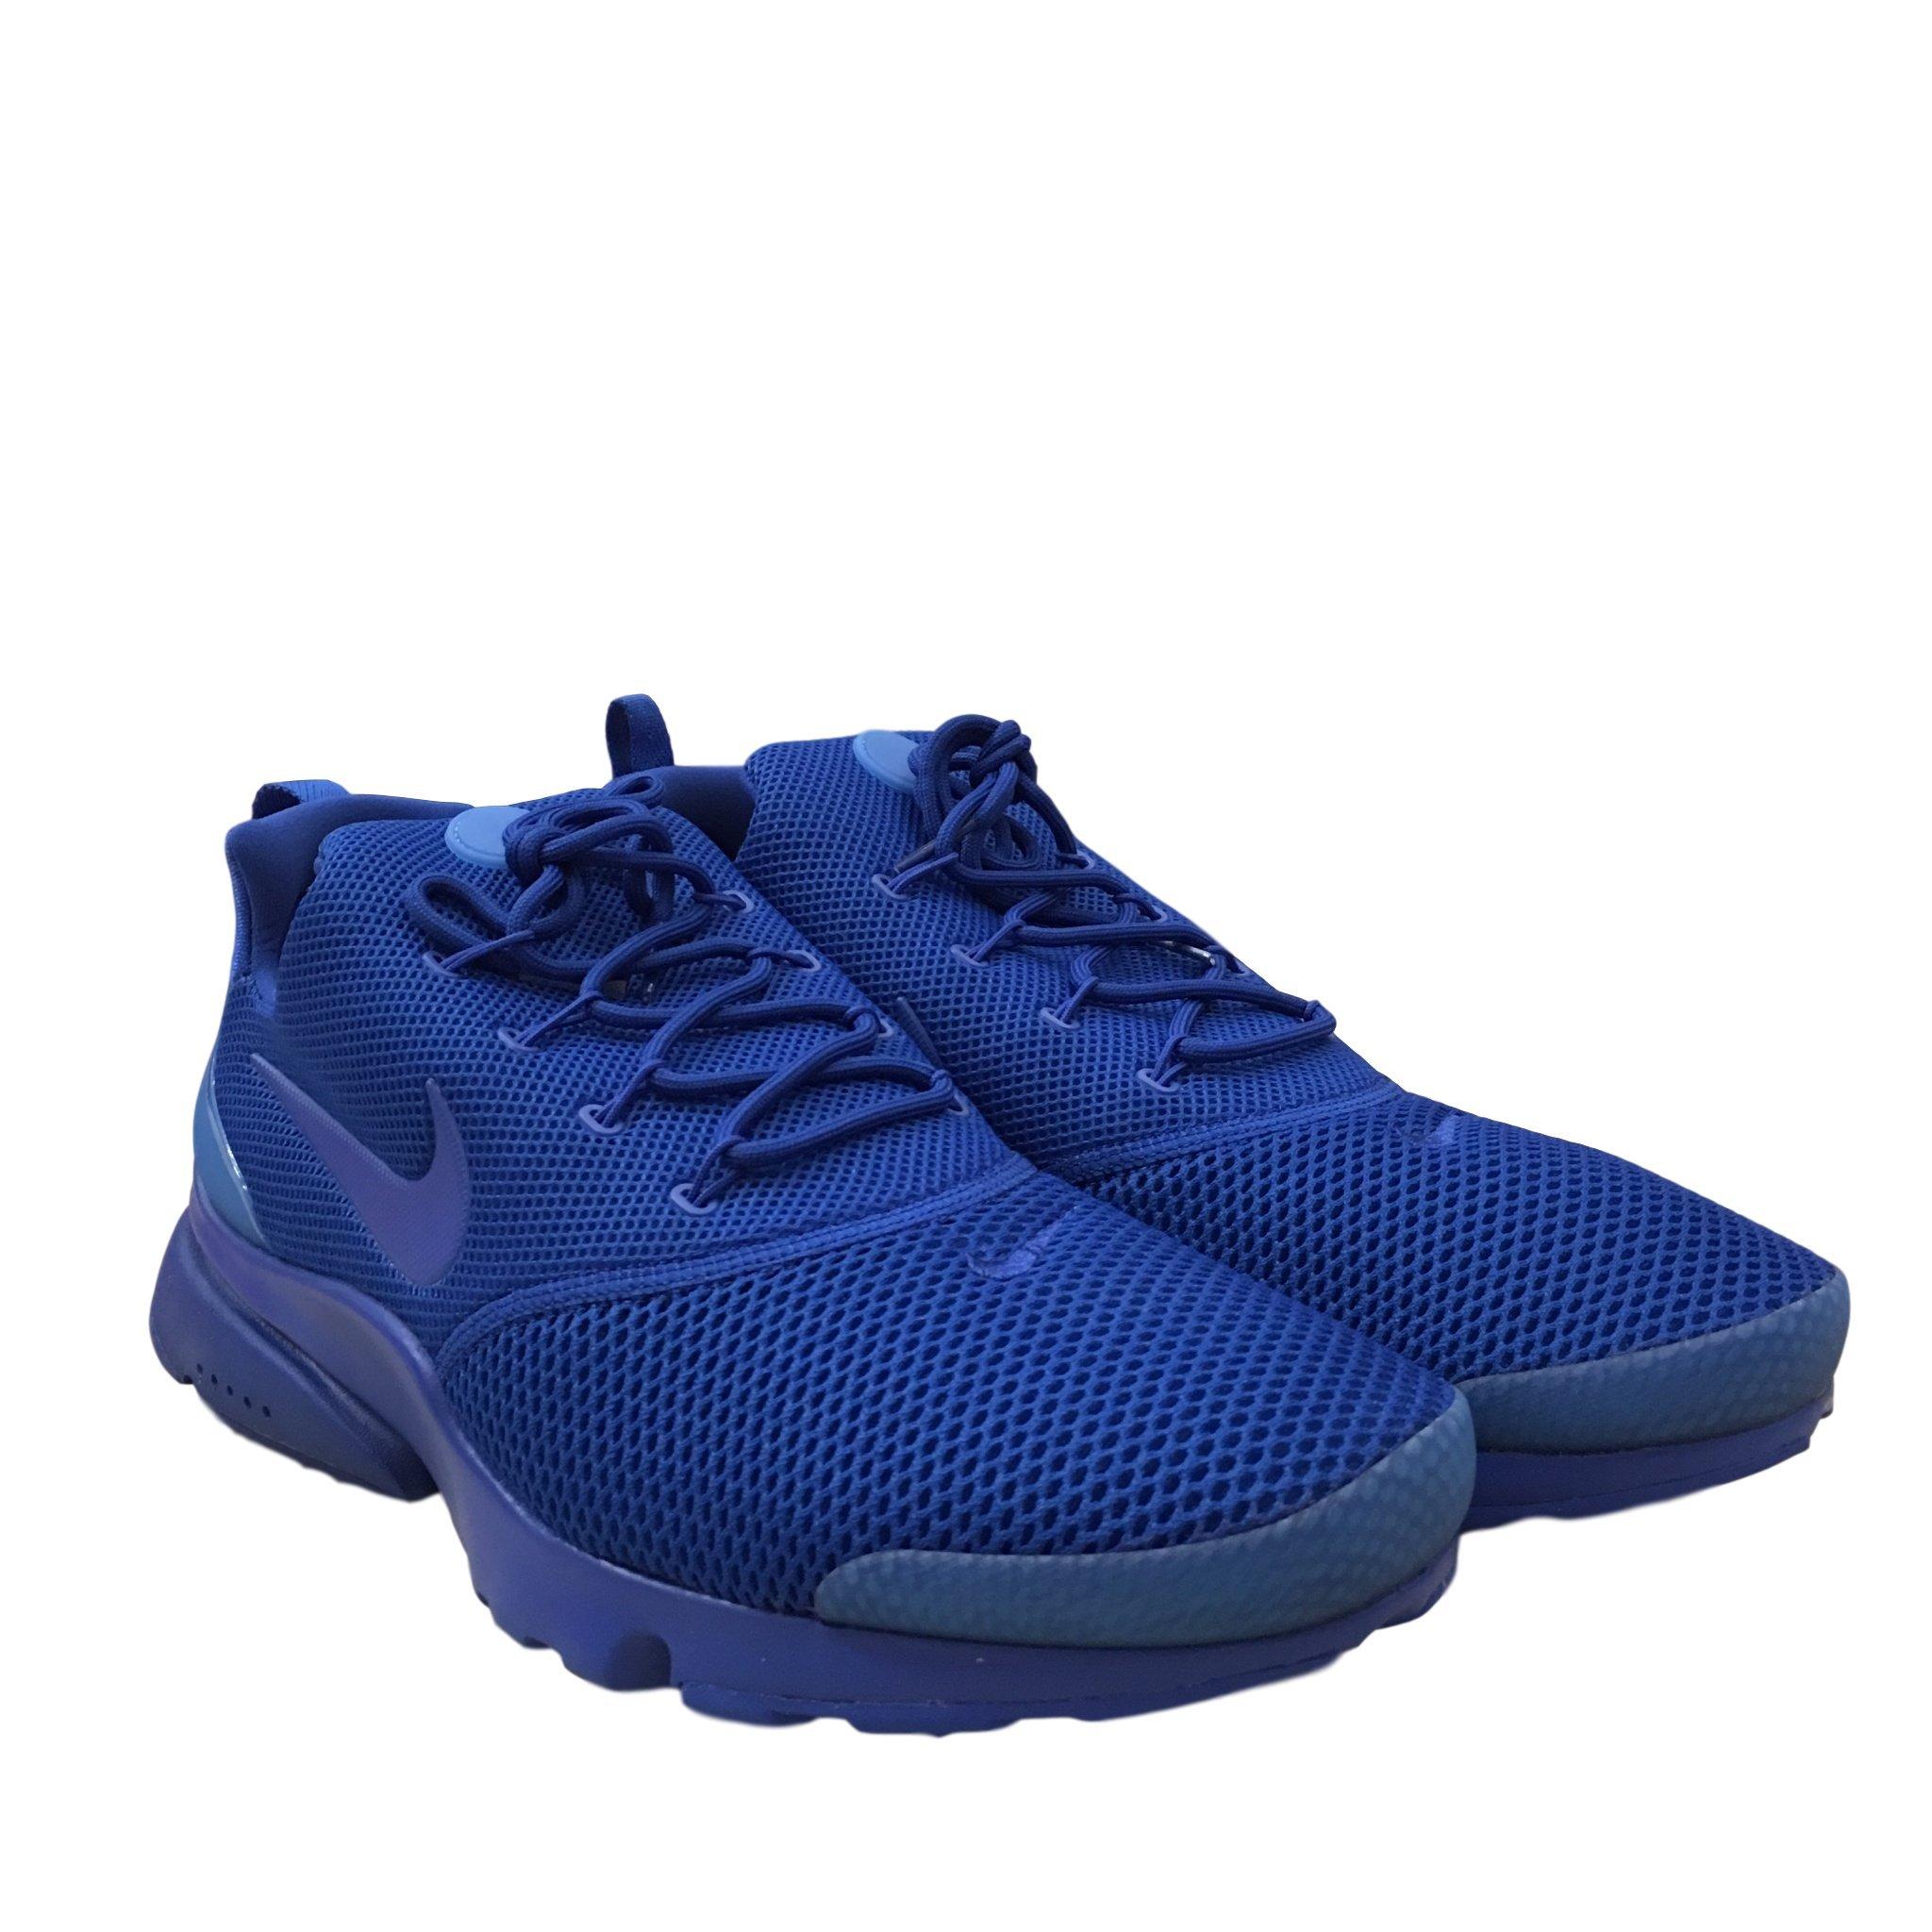 Galleon Nike Hombres Presto Volar Running Royal zapatilla Zapatos 8 Juego Royal Running 6928ac